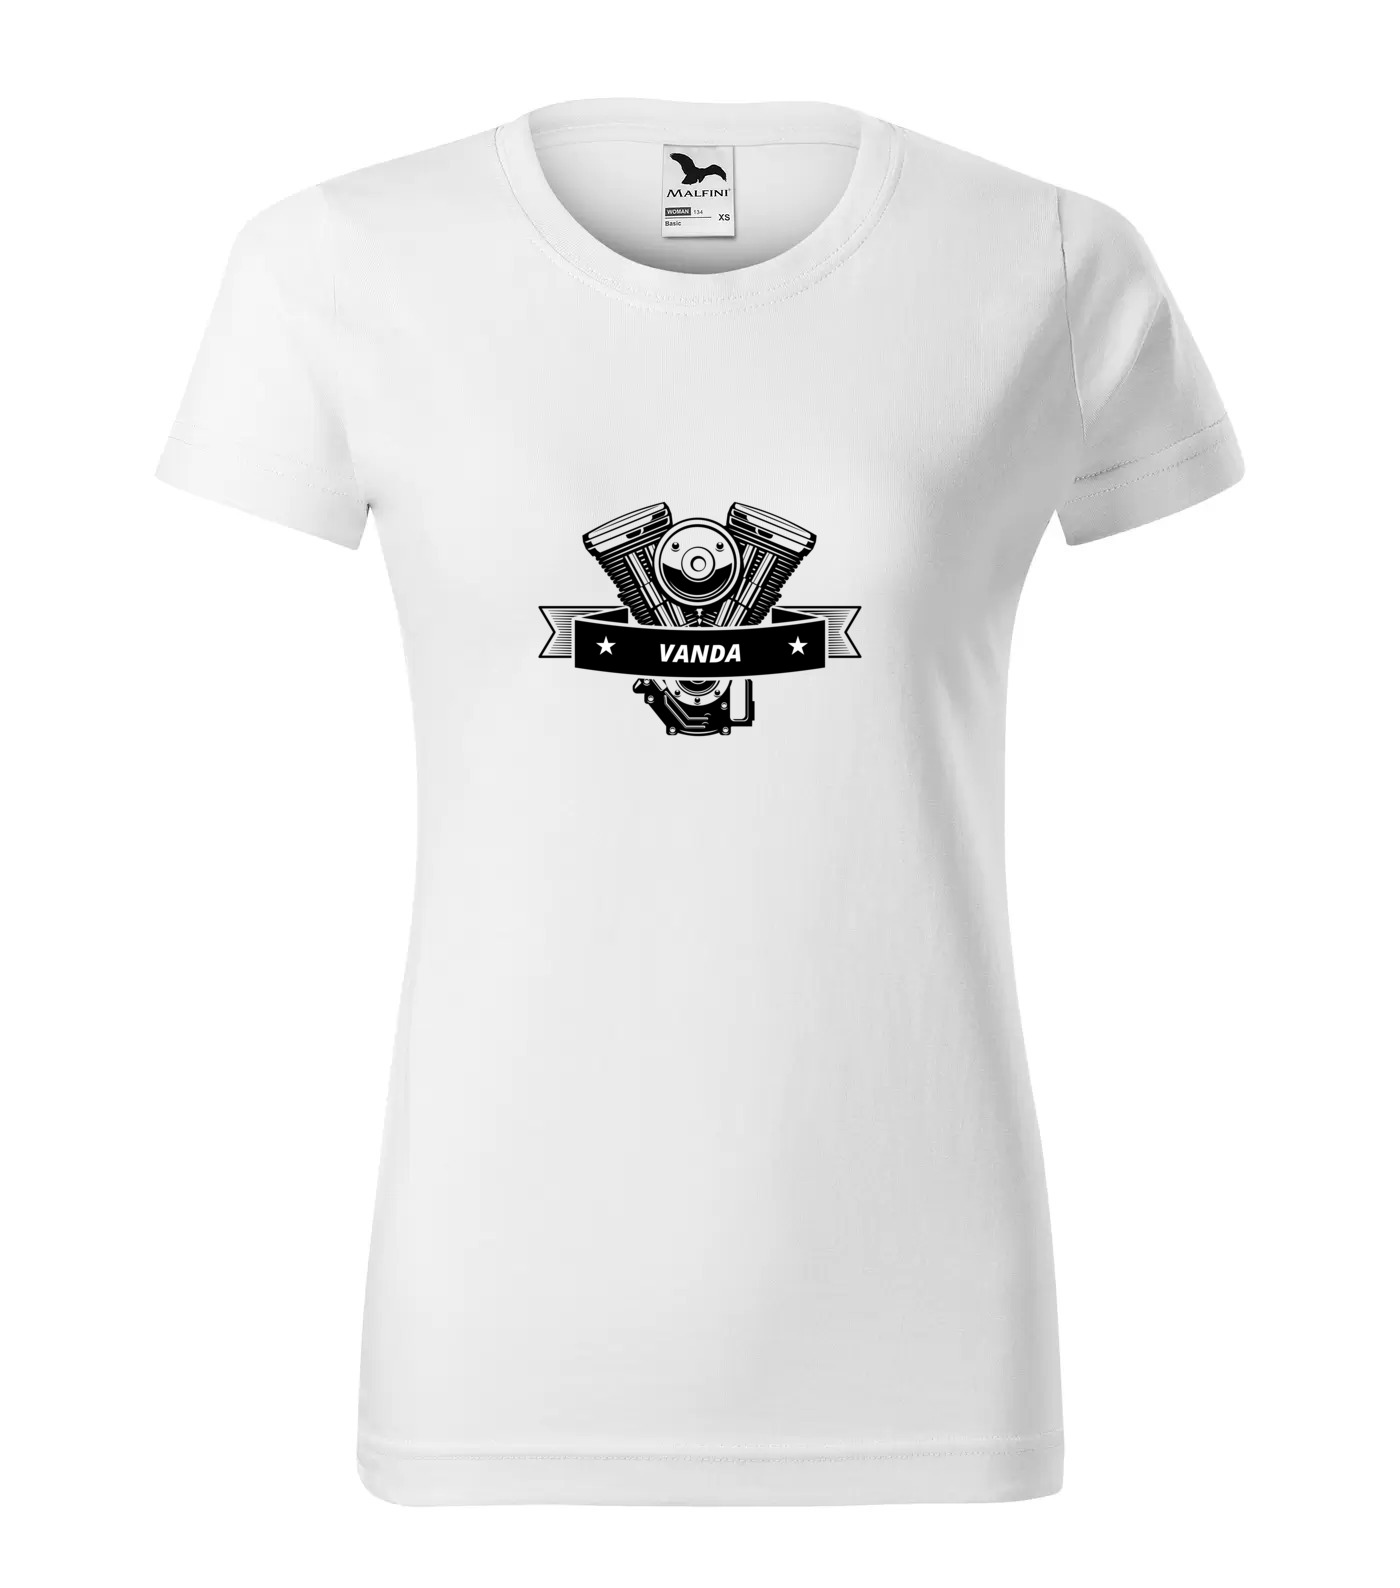 Tričko Motorkářka Vanda